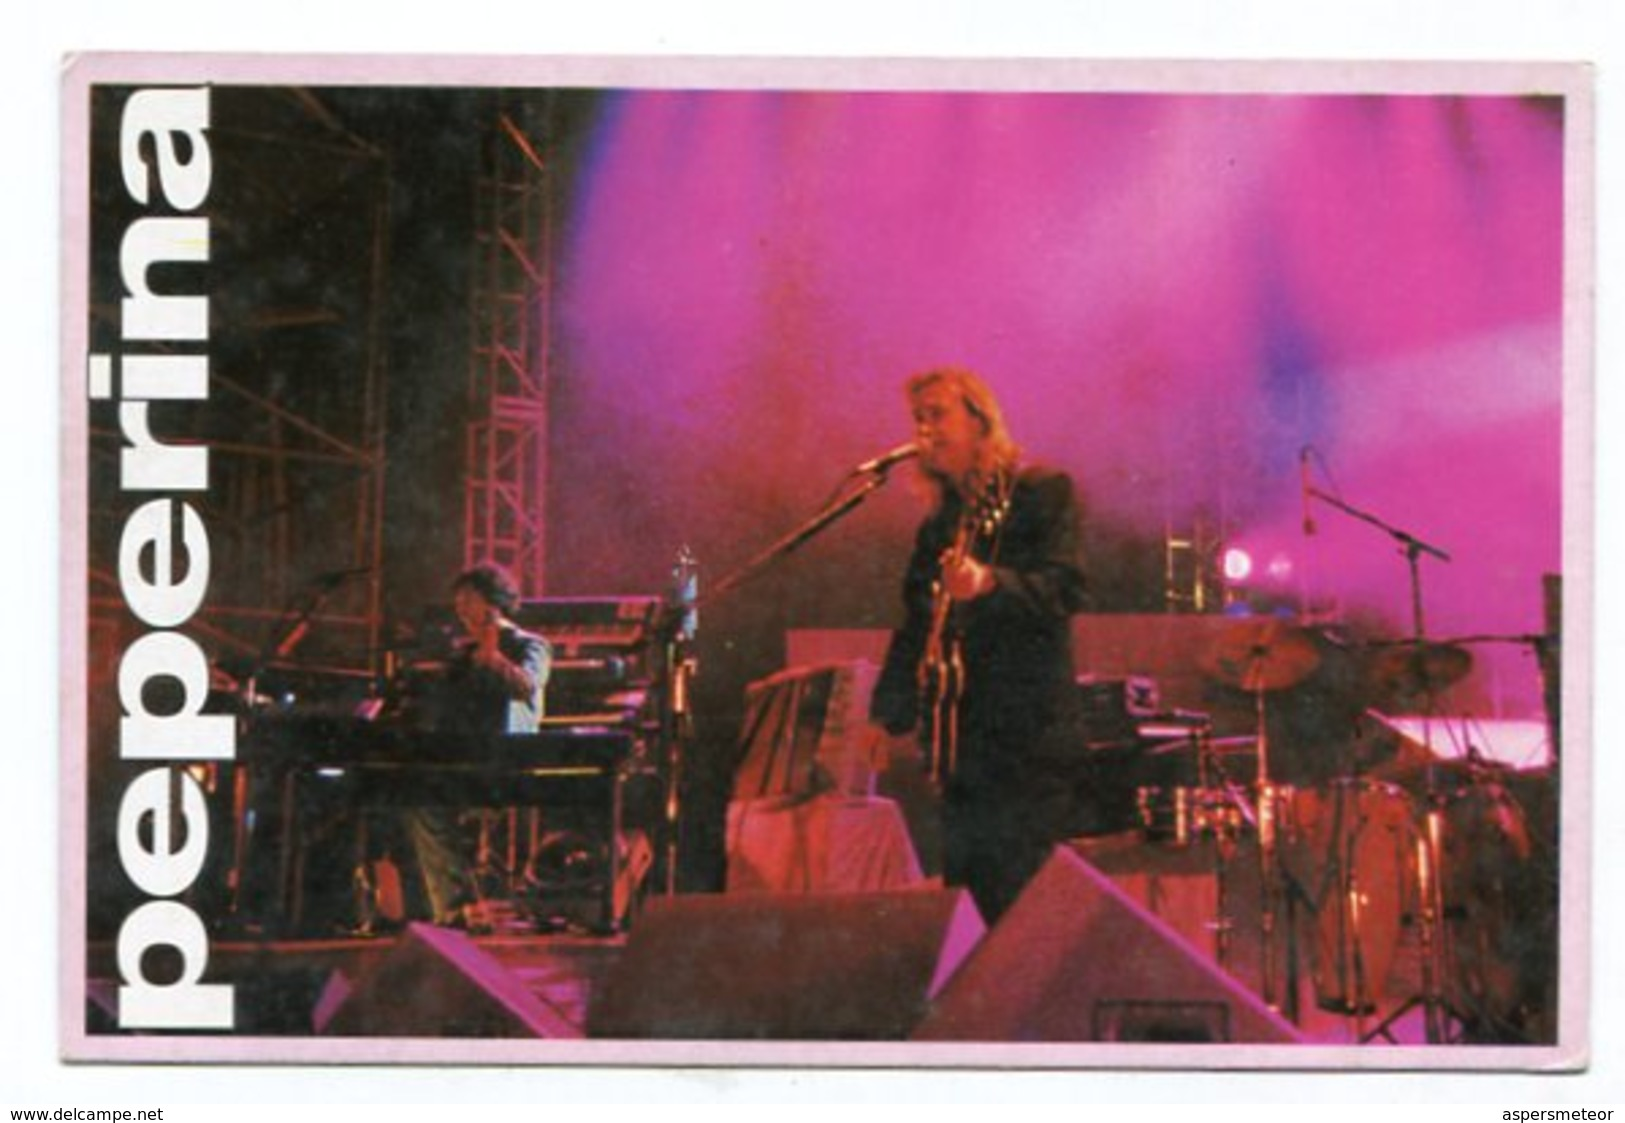 PEPERINA, CON PARTICIPACION DE SERU GIRAN, GRUPO MUSICA MUSIC - POSTAL PUBLICIDAD ARGENTINA CIRCA 2000 - LILHU - Música Y Músicos